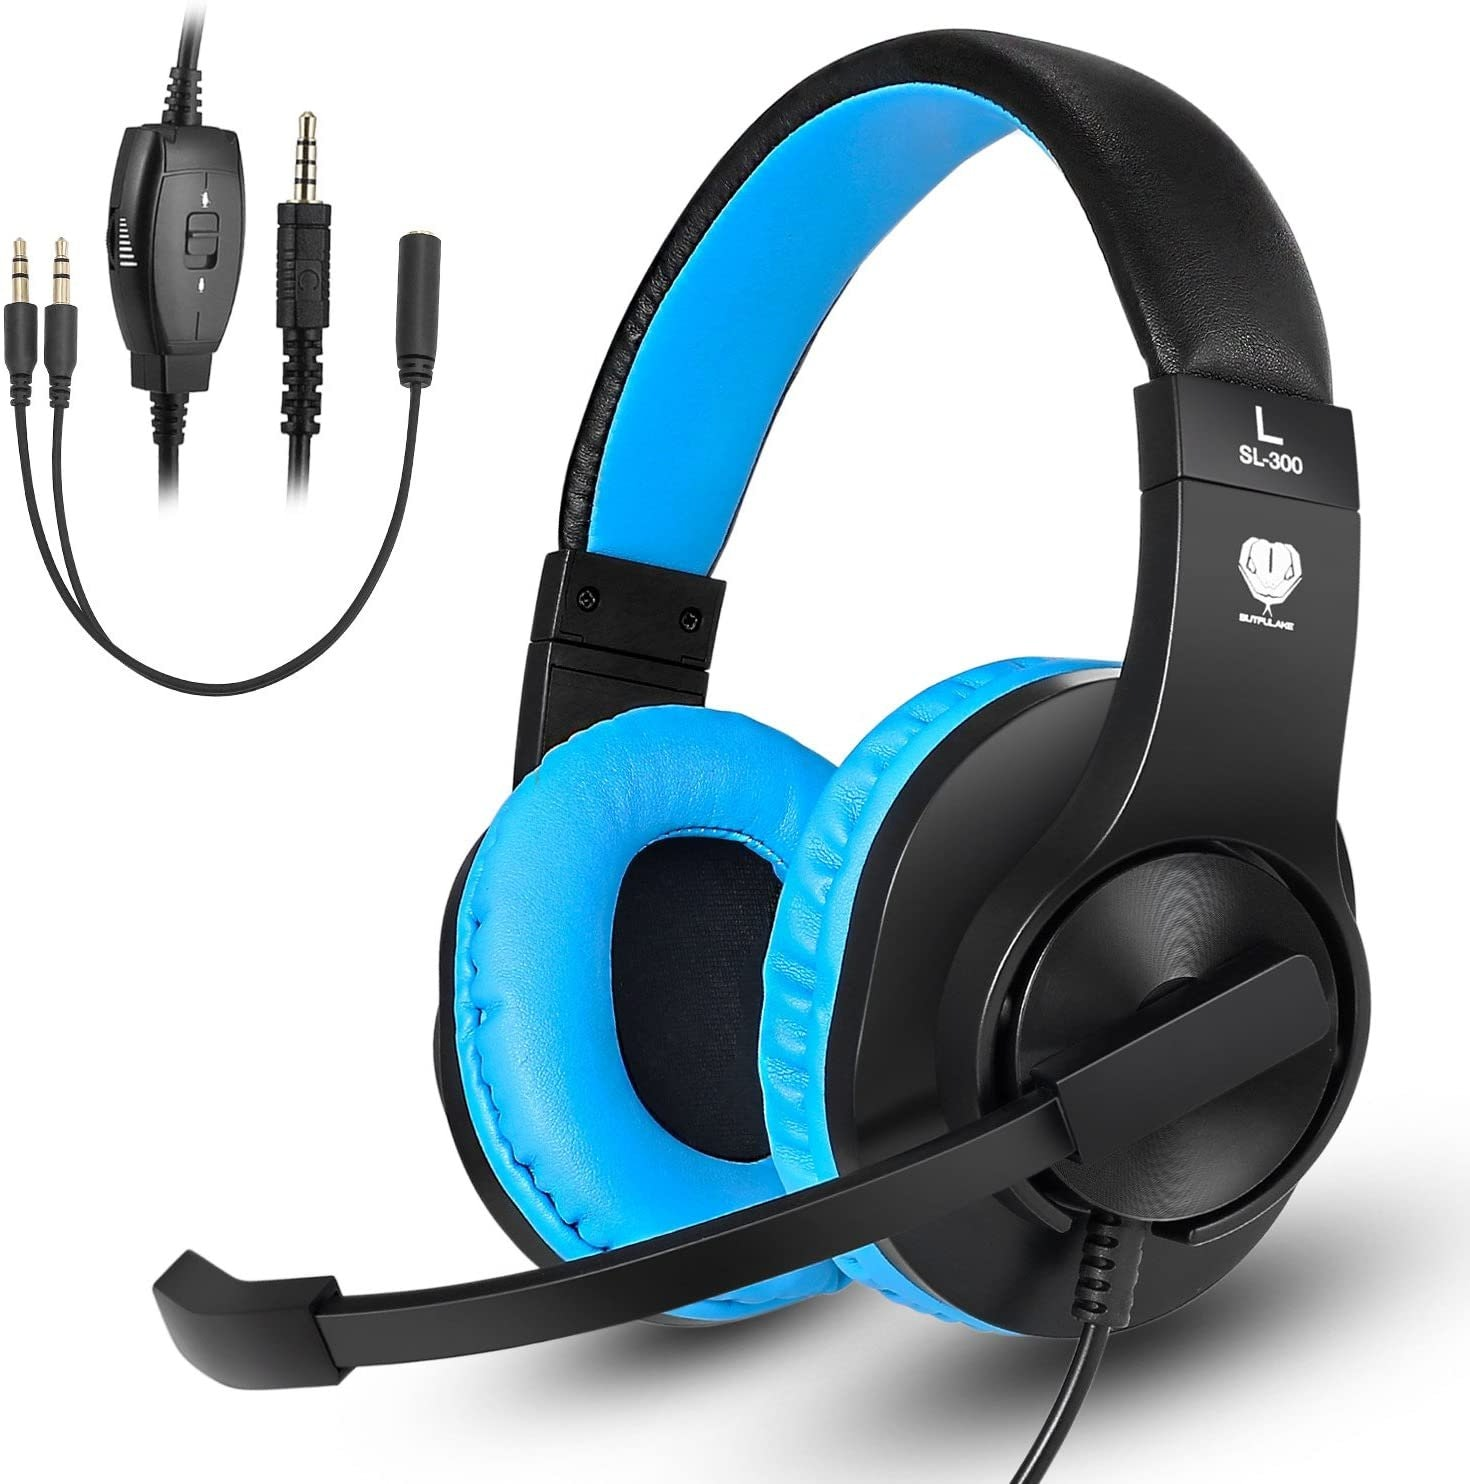 Butfulake Stereo Gaming Headset